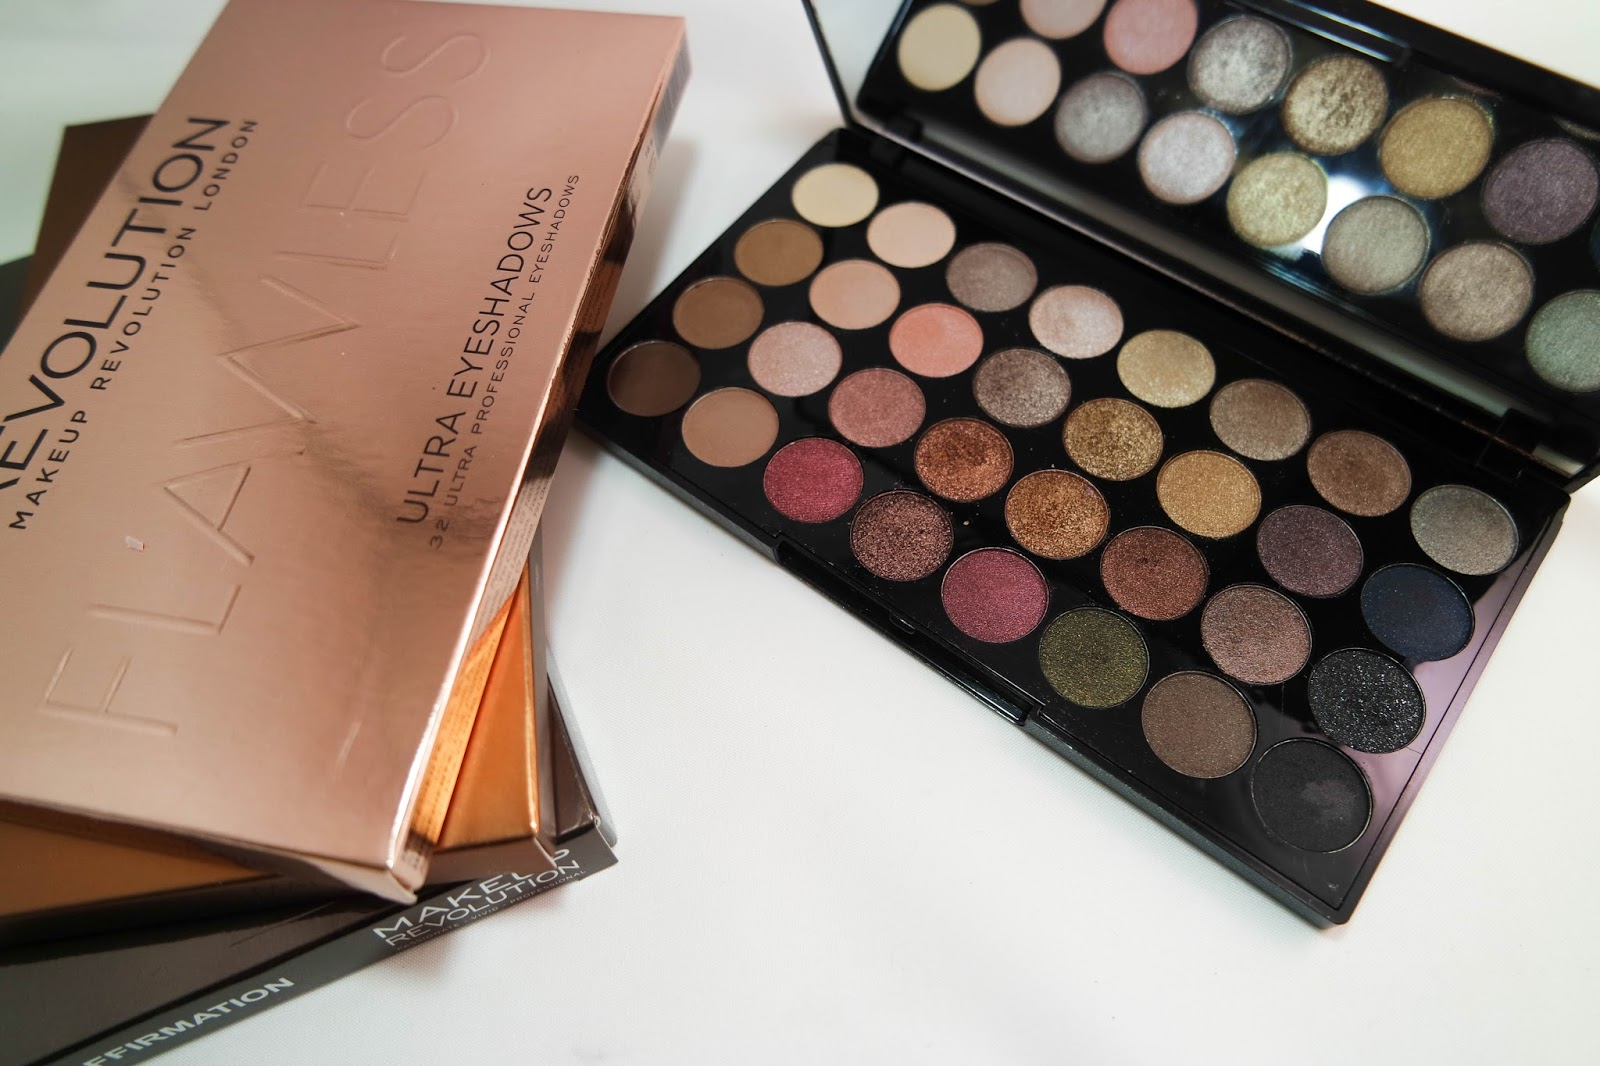 makeup revolution ultra eyeshadow palette in flawless. Black Bedroom Furniture Sets. Home Design Ideas